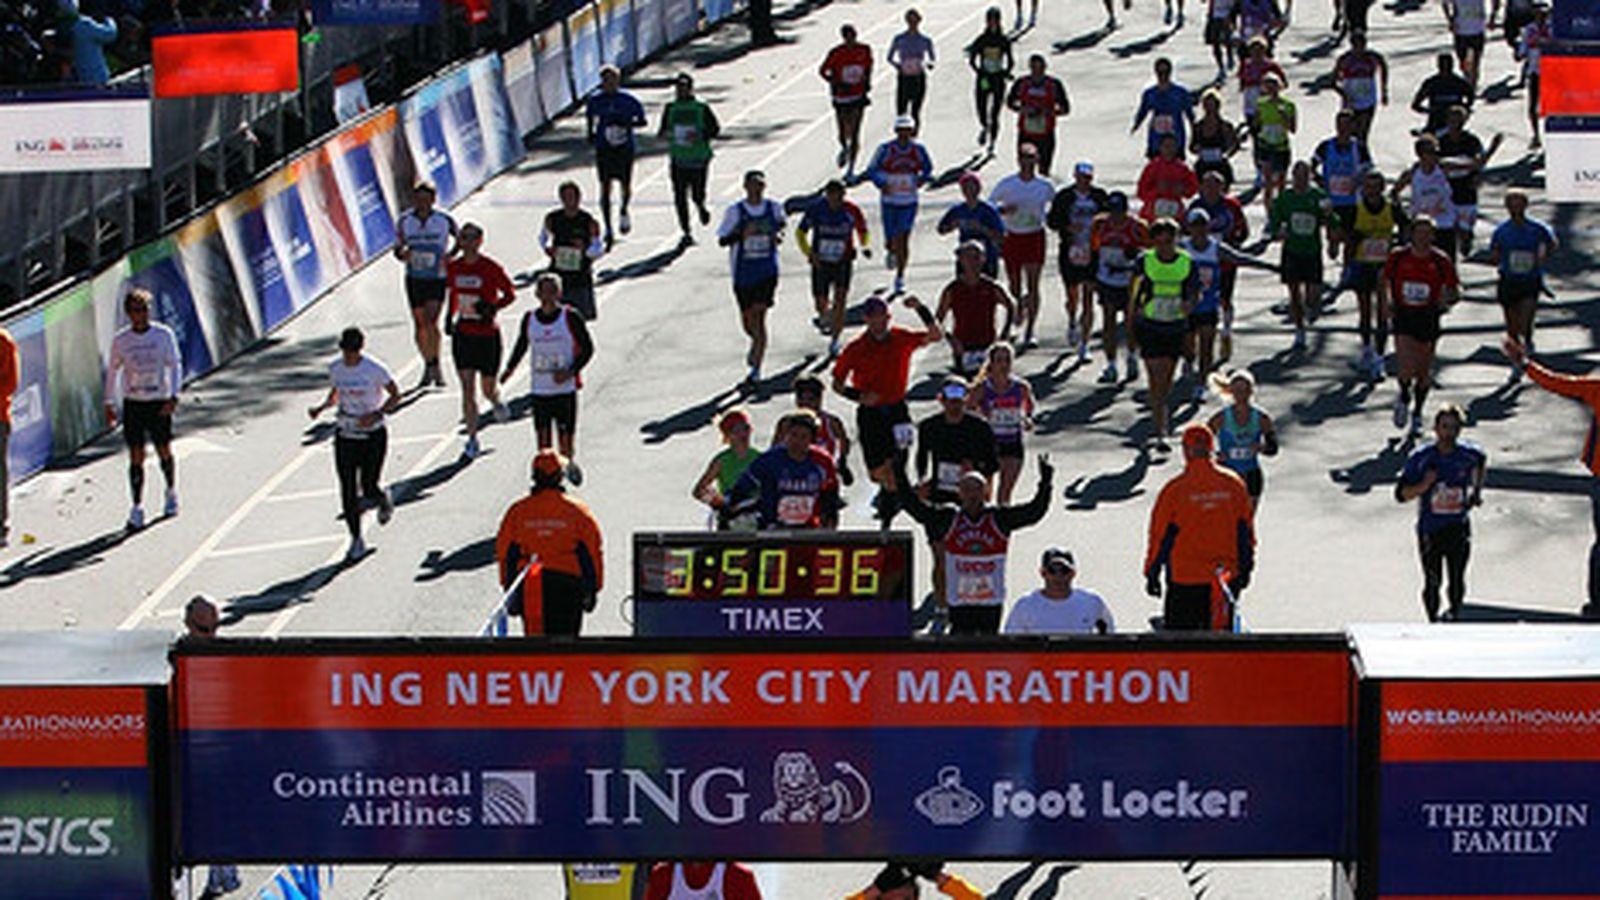 New York City Marathon  Route Information Course Map And - Nyc marathon course map pdf